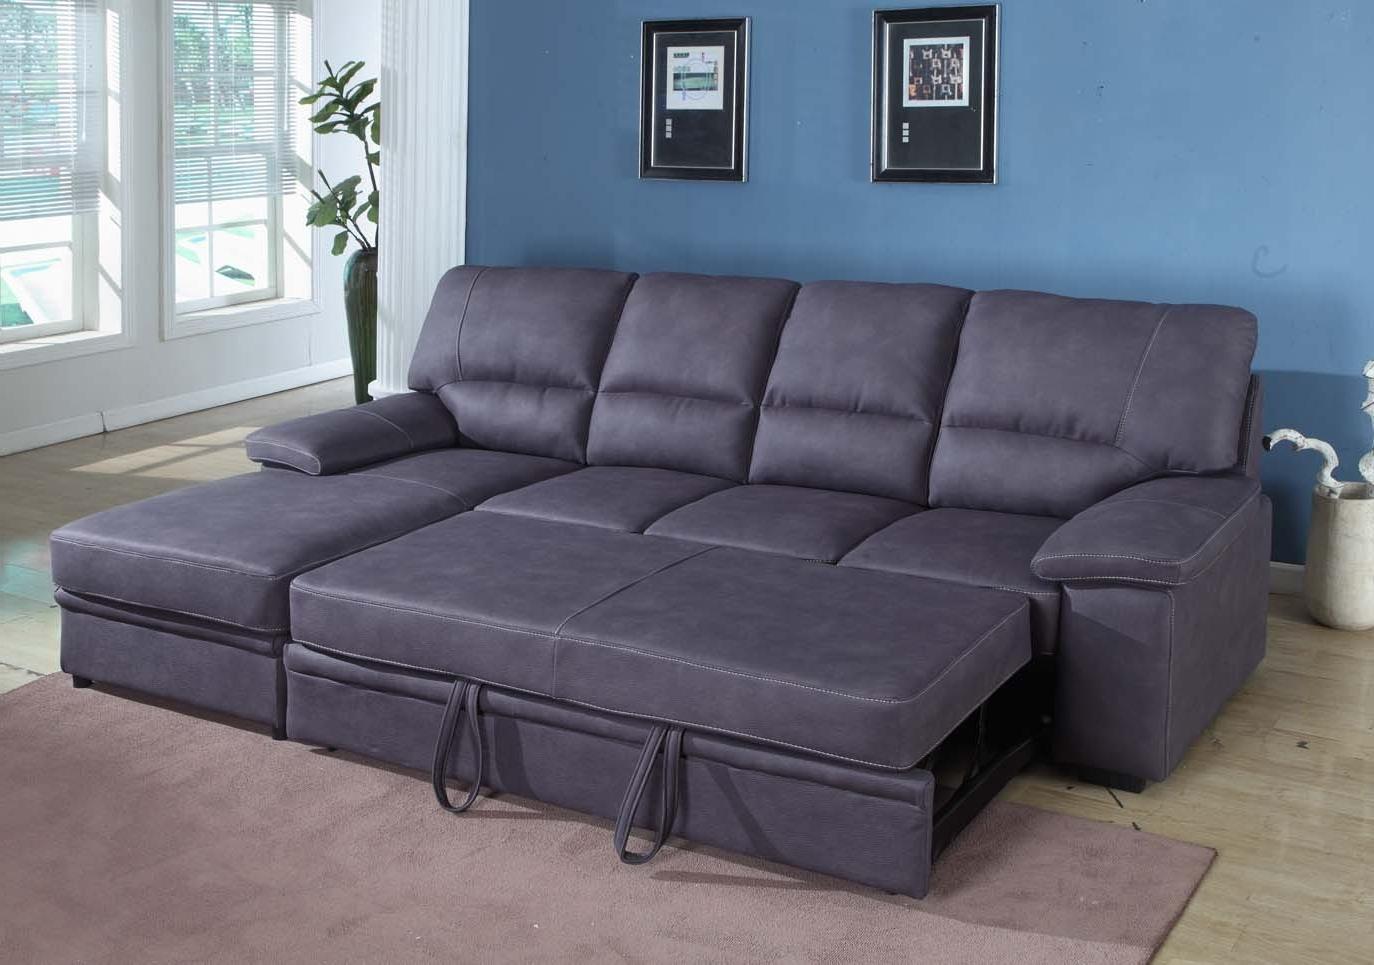 Grey Sleeper Sectional Sofa (View 9 of 20)